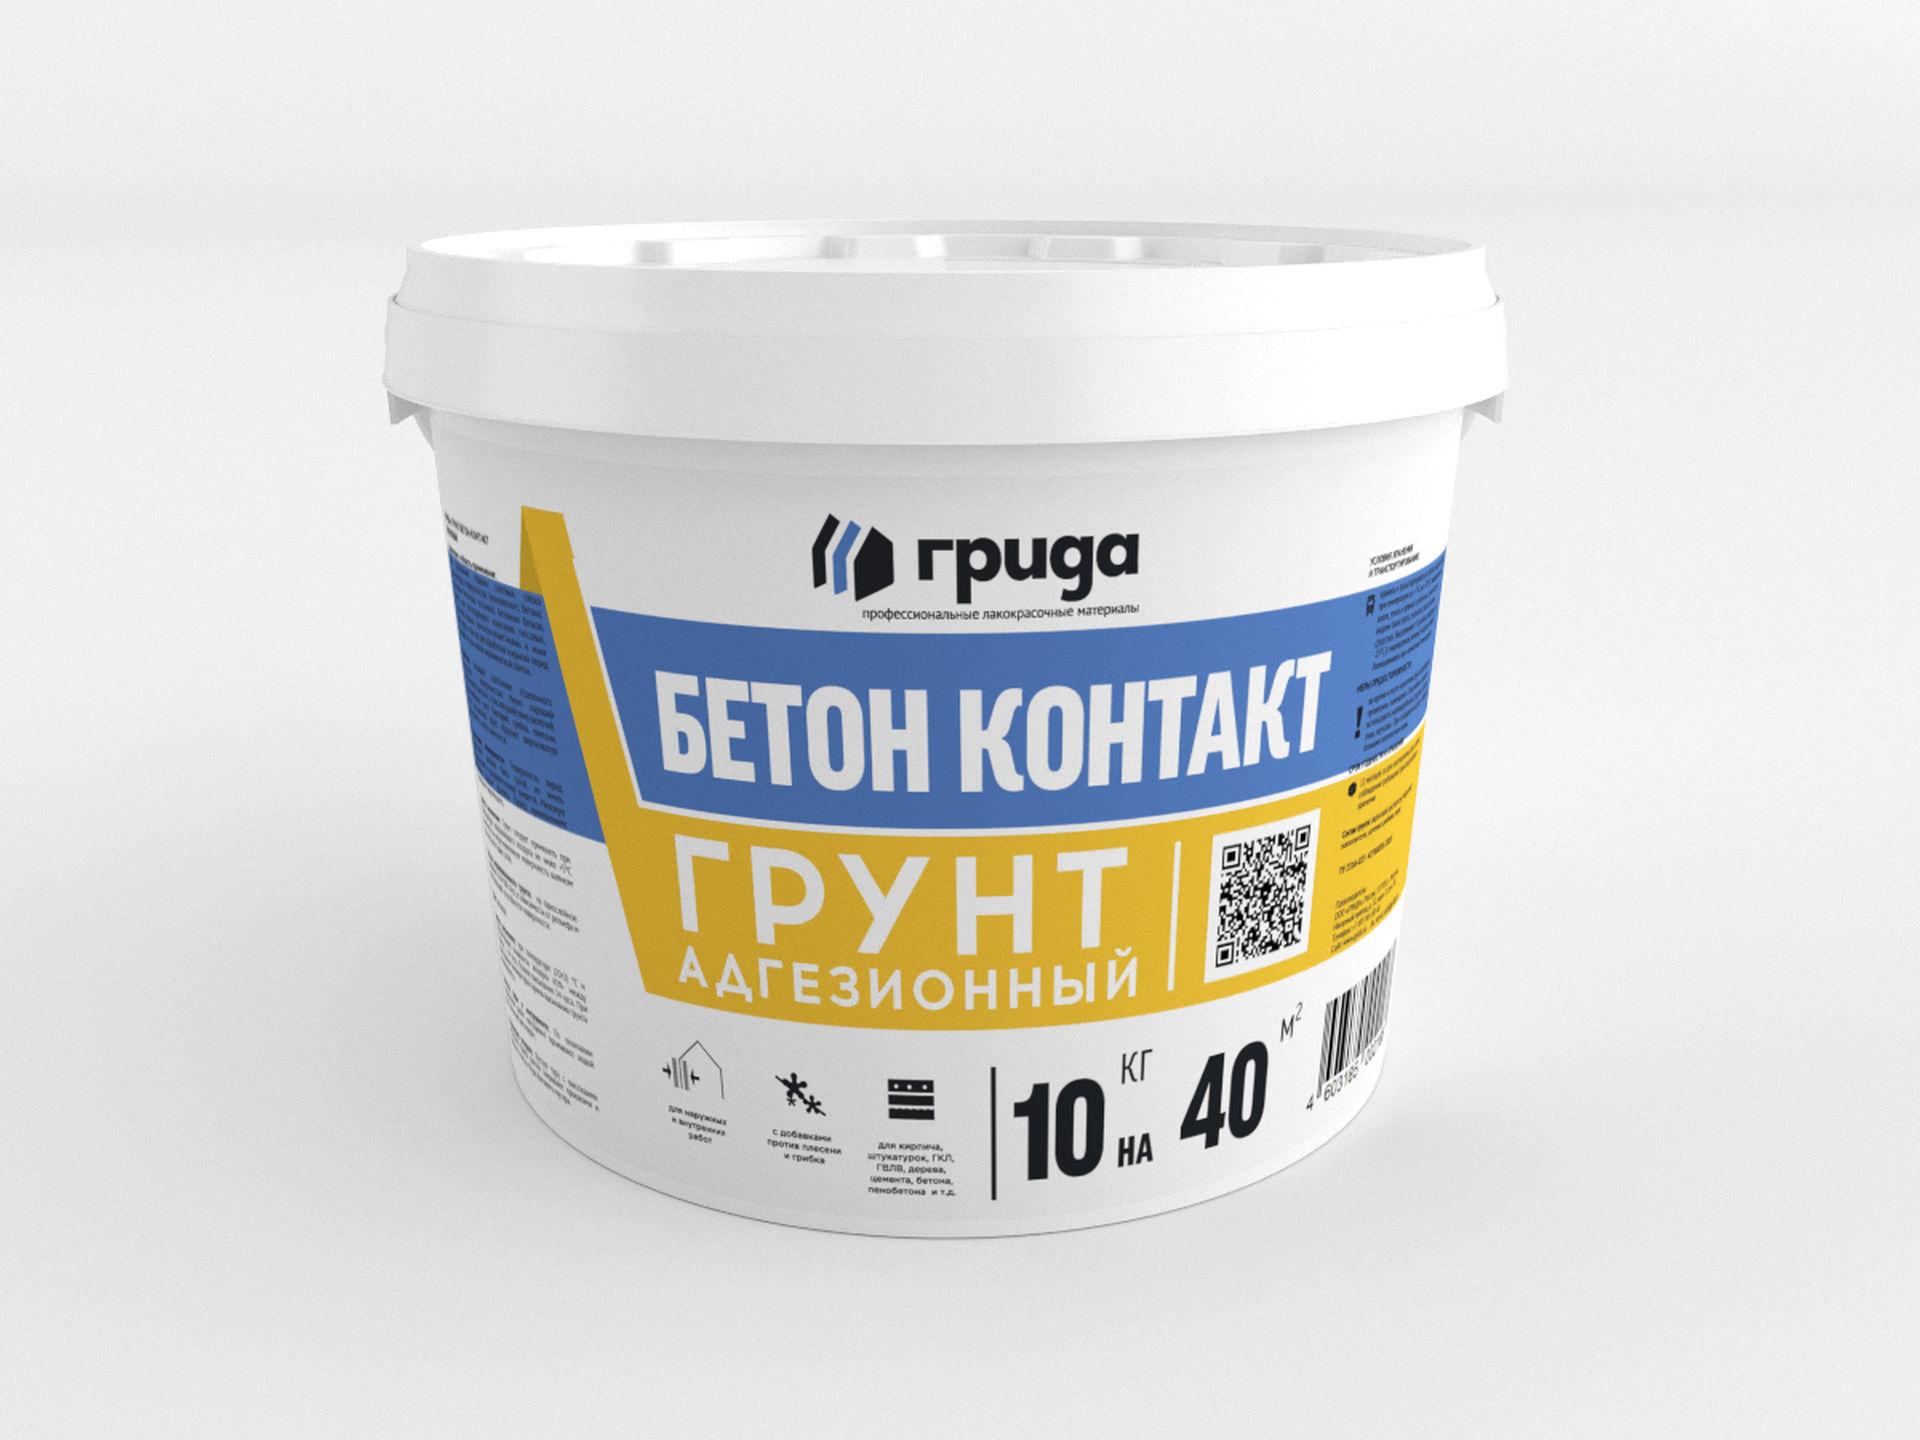 бетон контакт характеристики